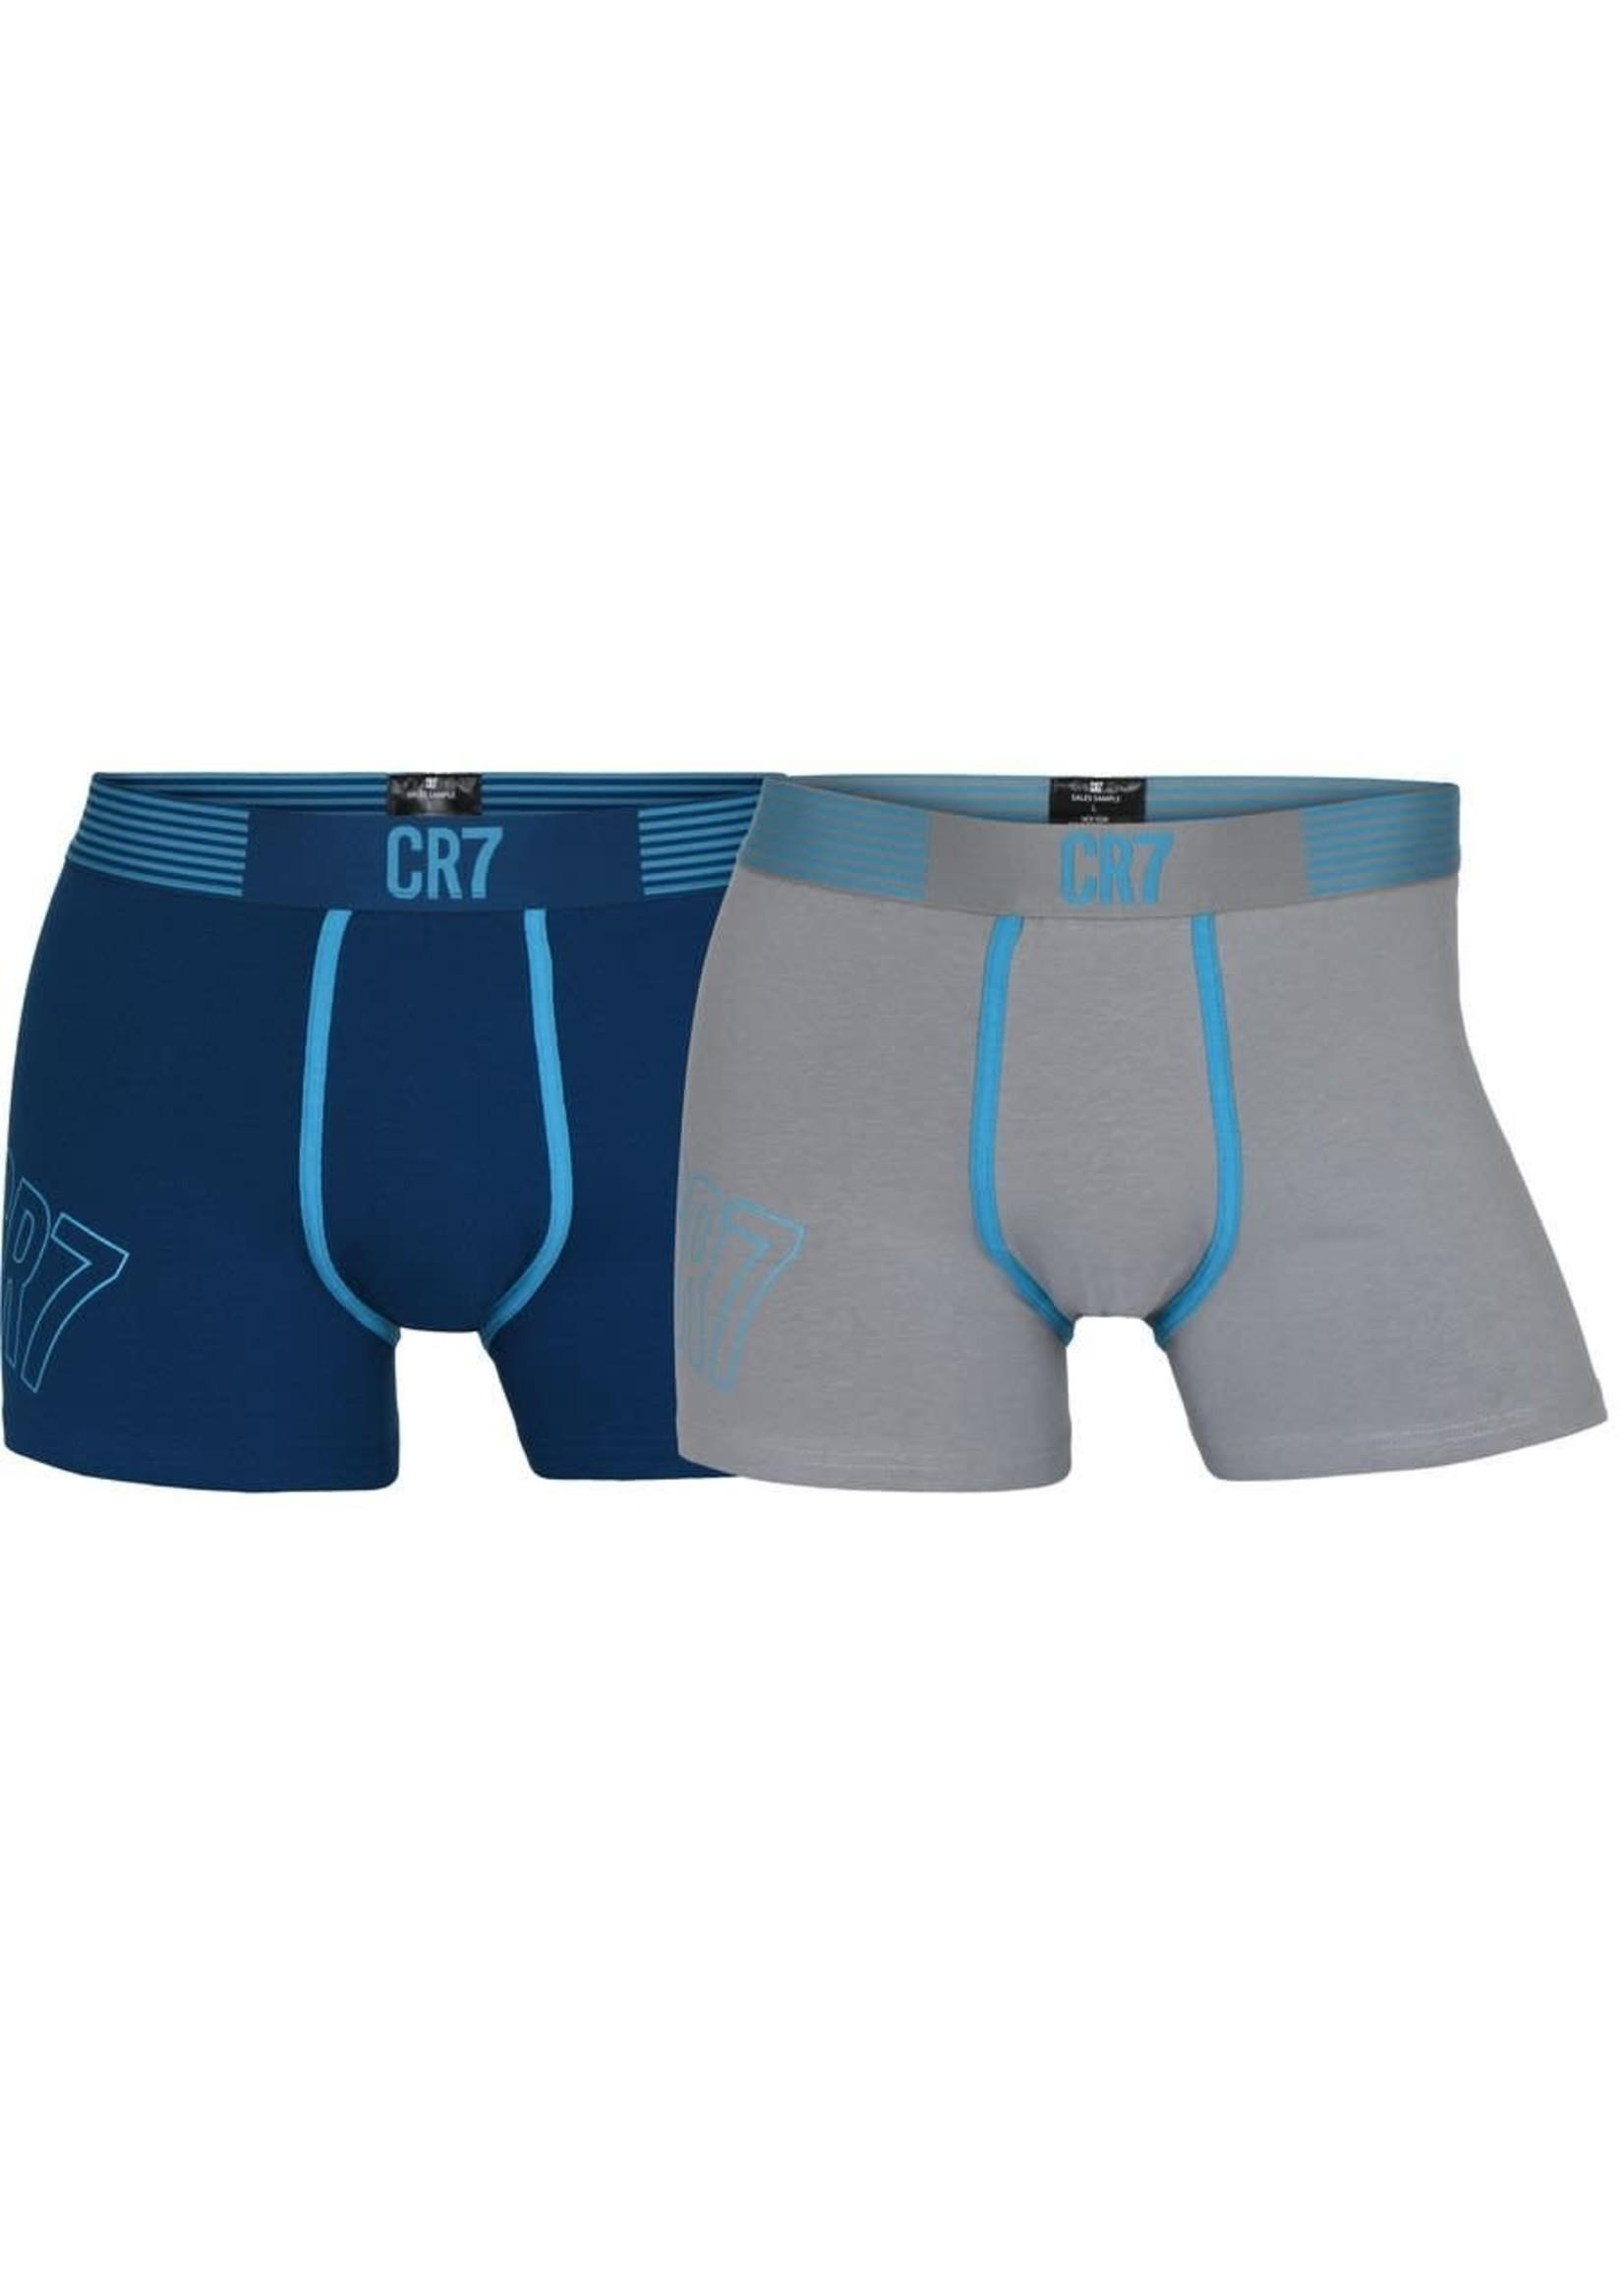 CR7 Boxer Underwear 2-Pack - Blue/Grey Adult